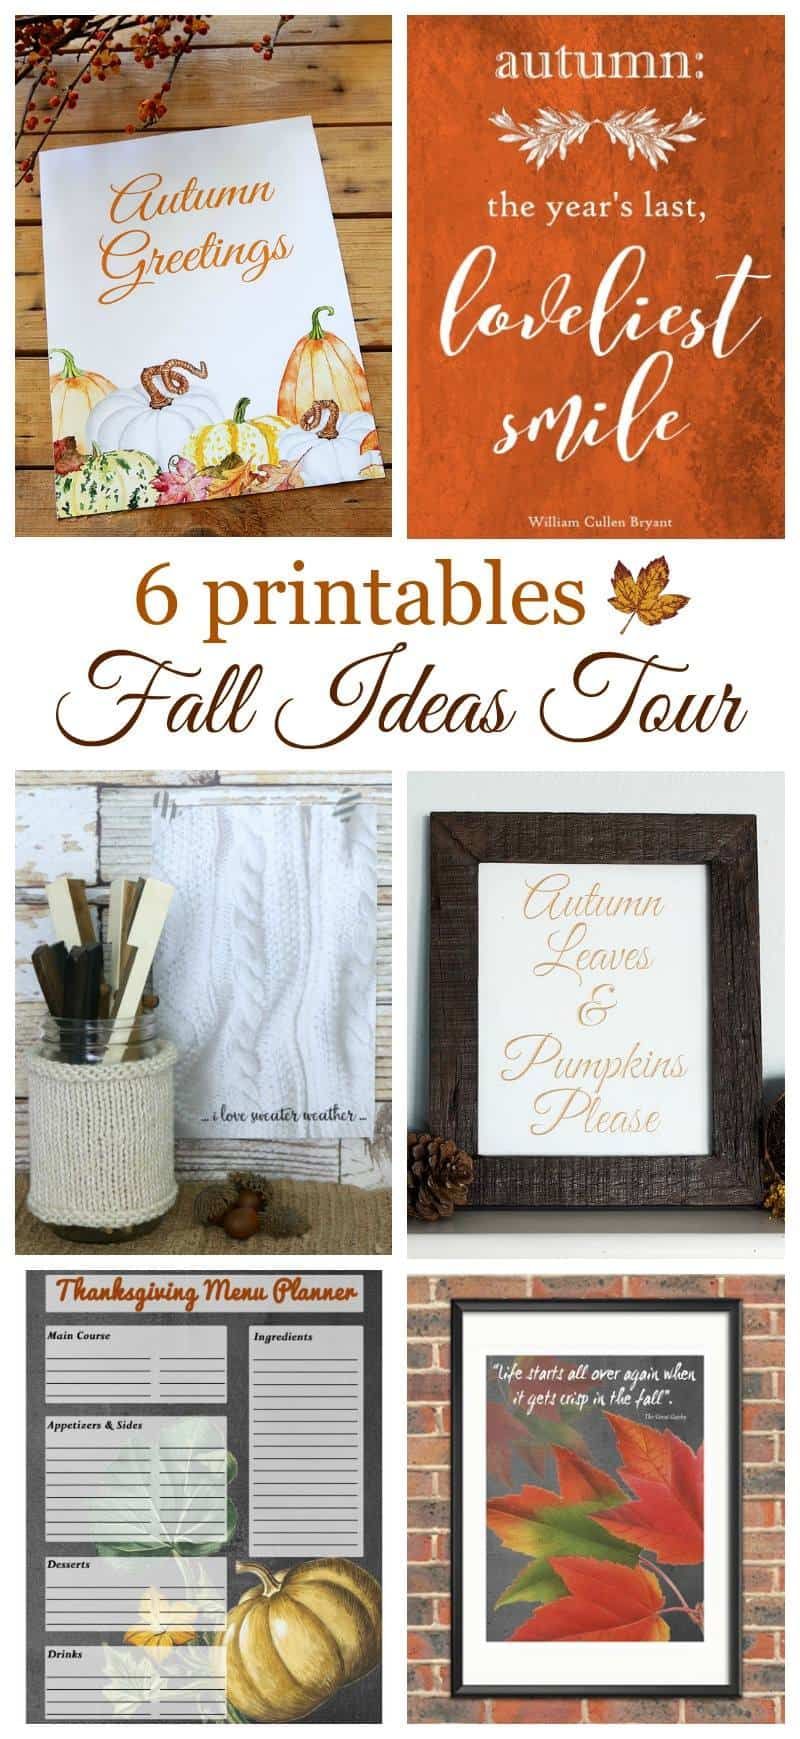 6 Fall Printables